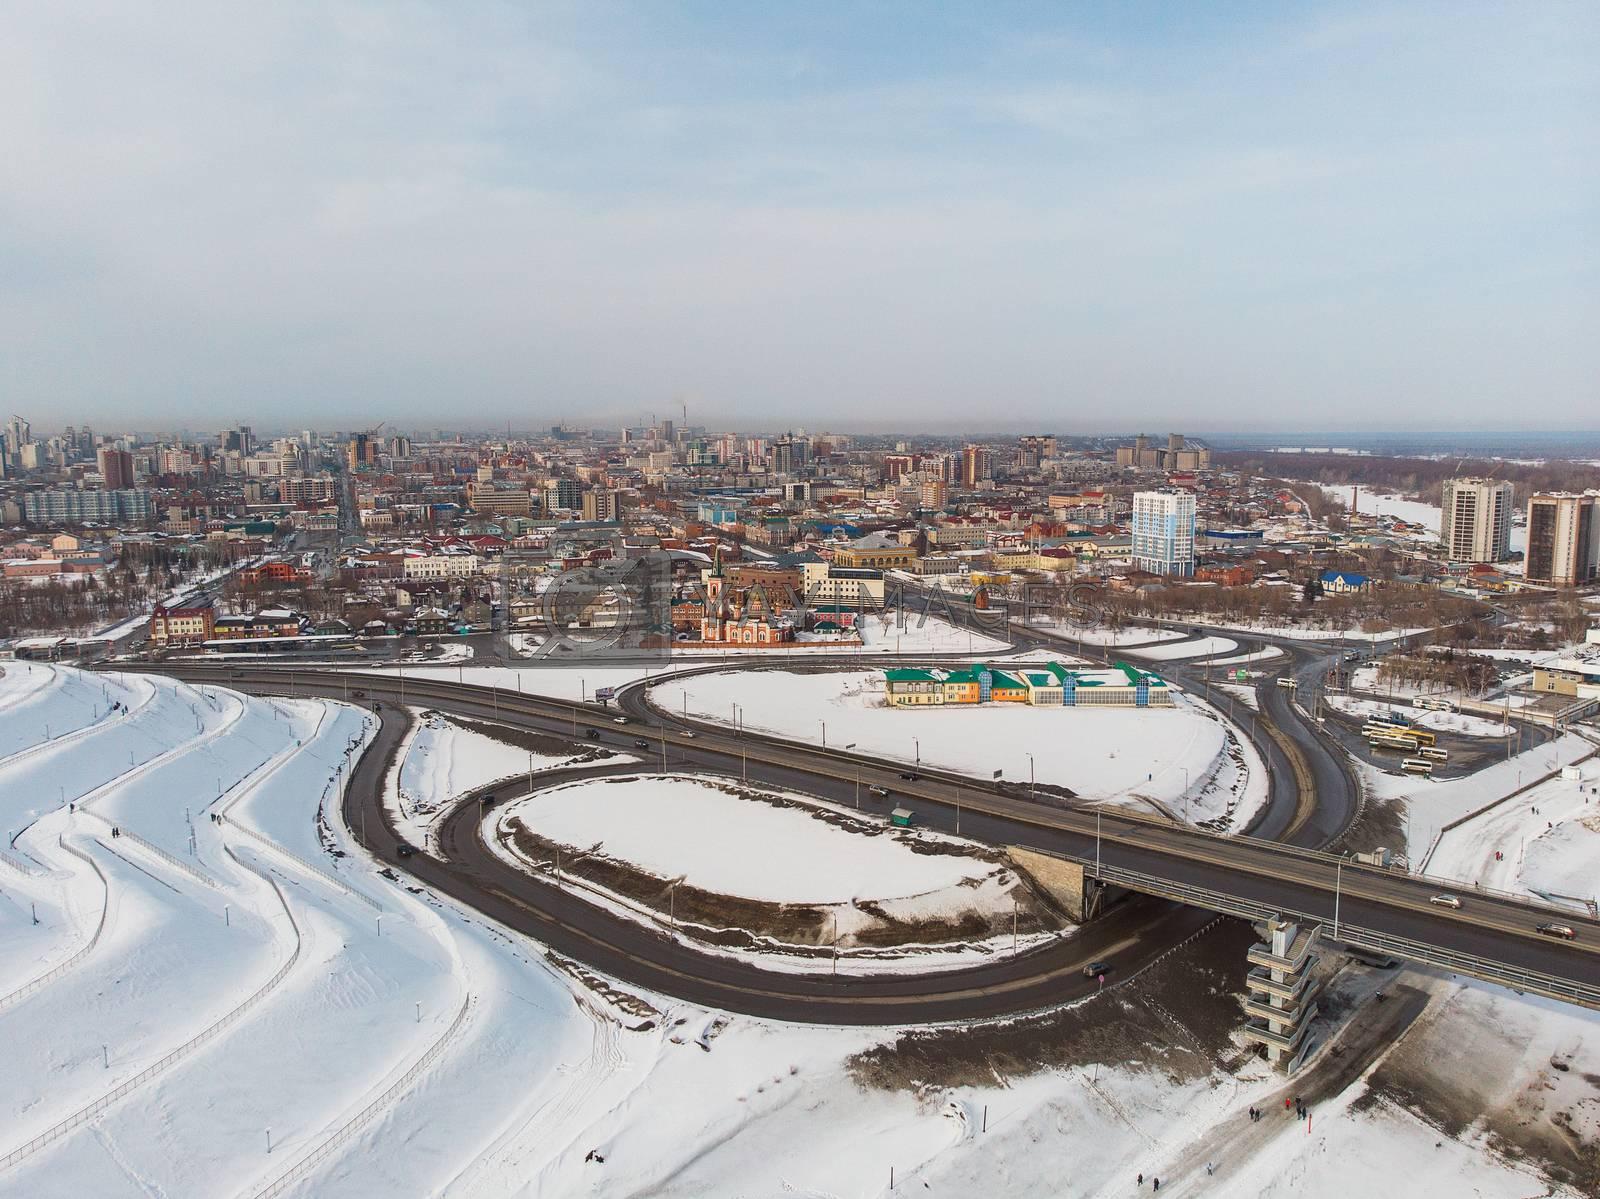 Aerial shot of bridge and car driving on the bridge, winter sunny day in Barnaul, Siberia, Russia